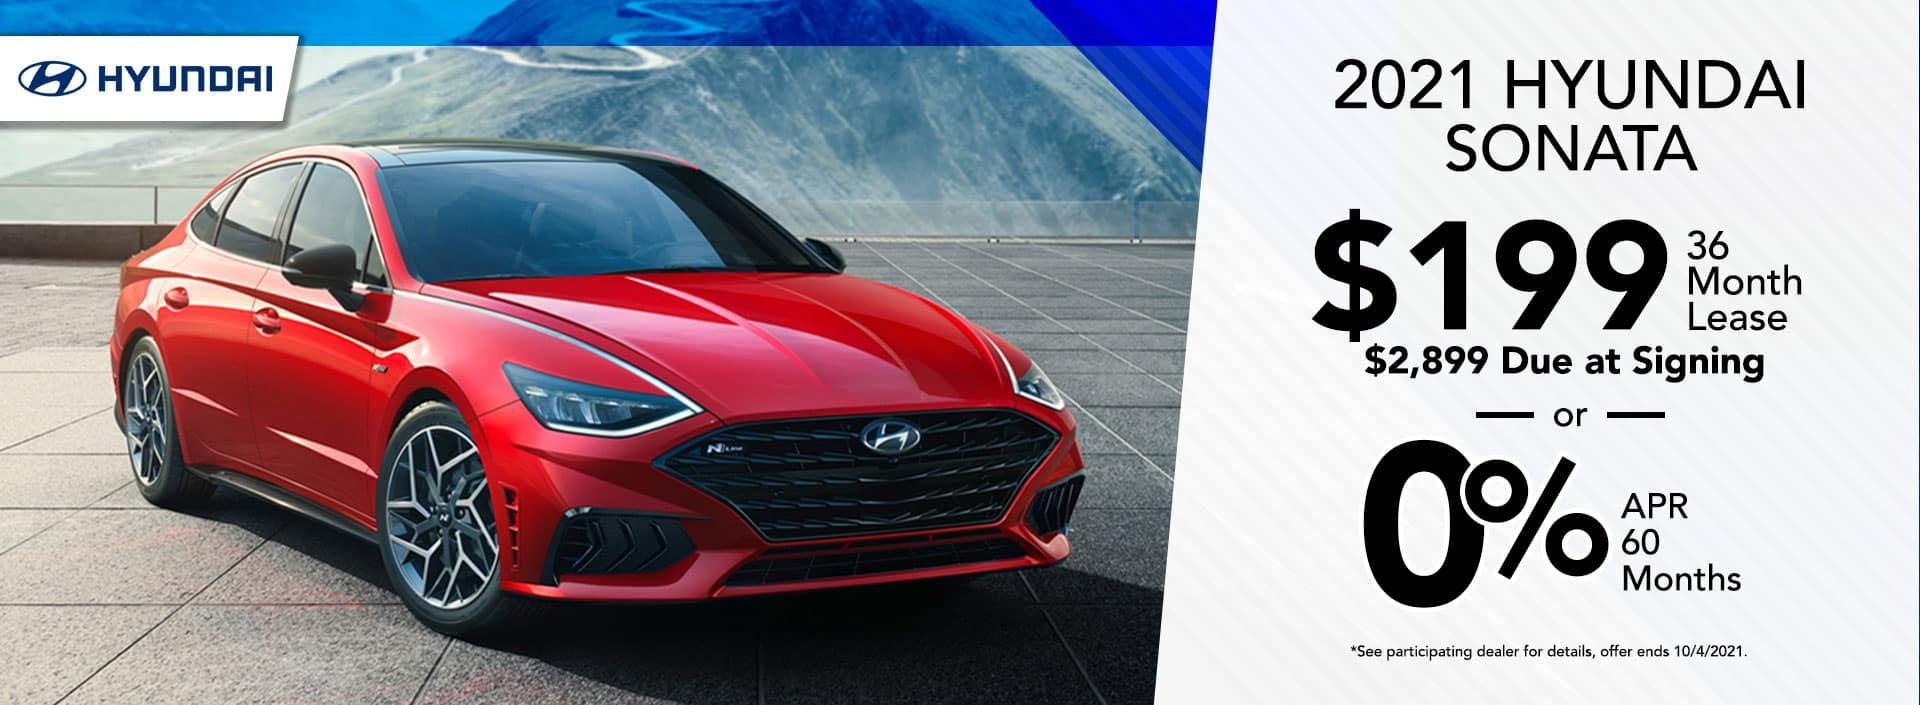 2021_Hyundai_Sonata_NoLogo